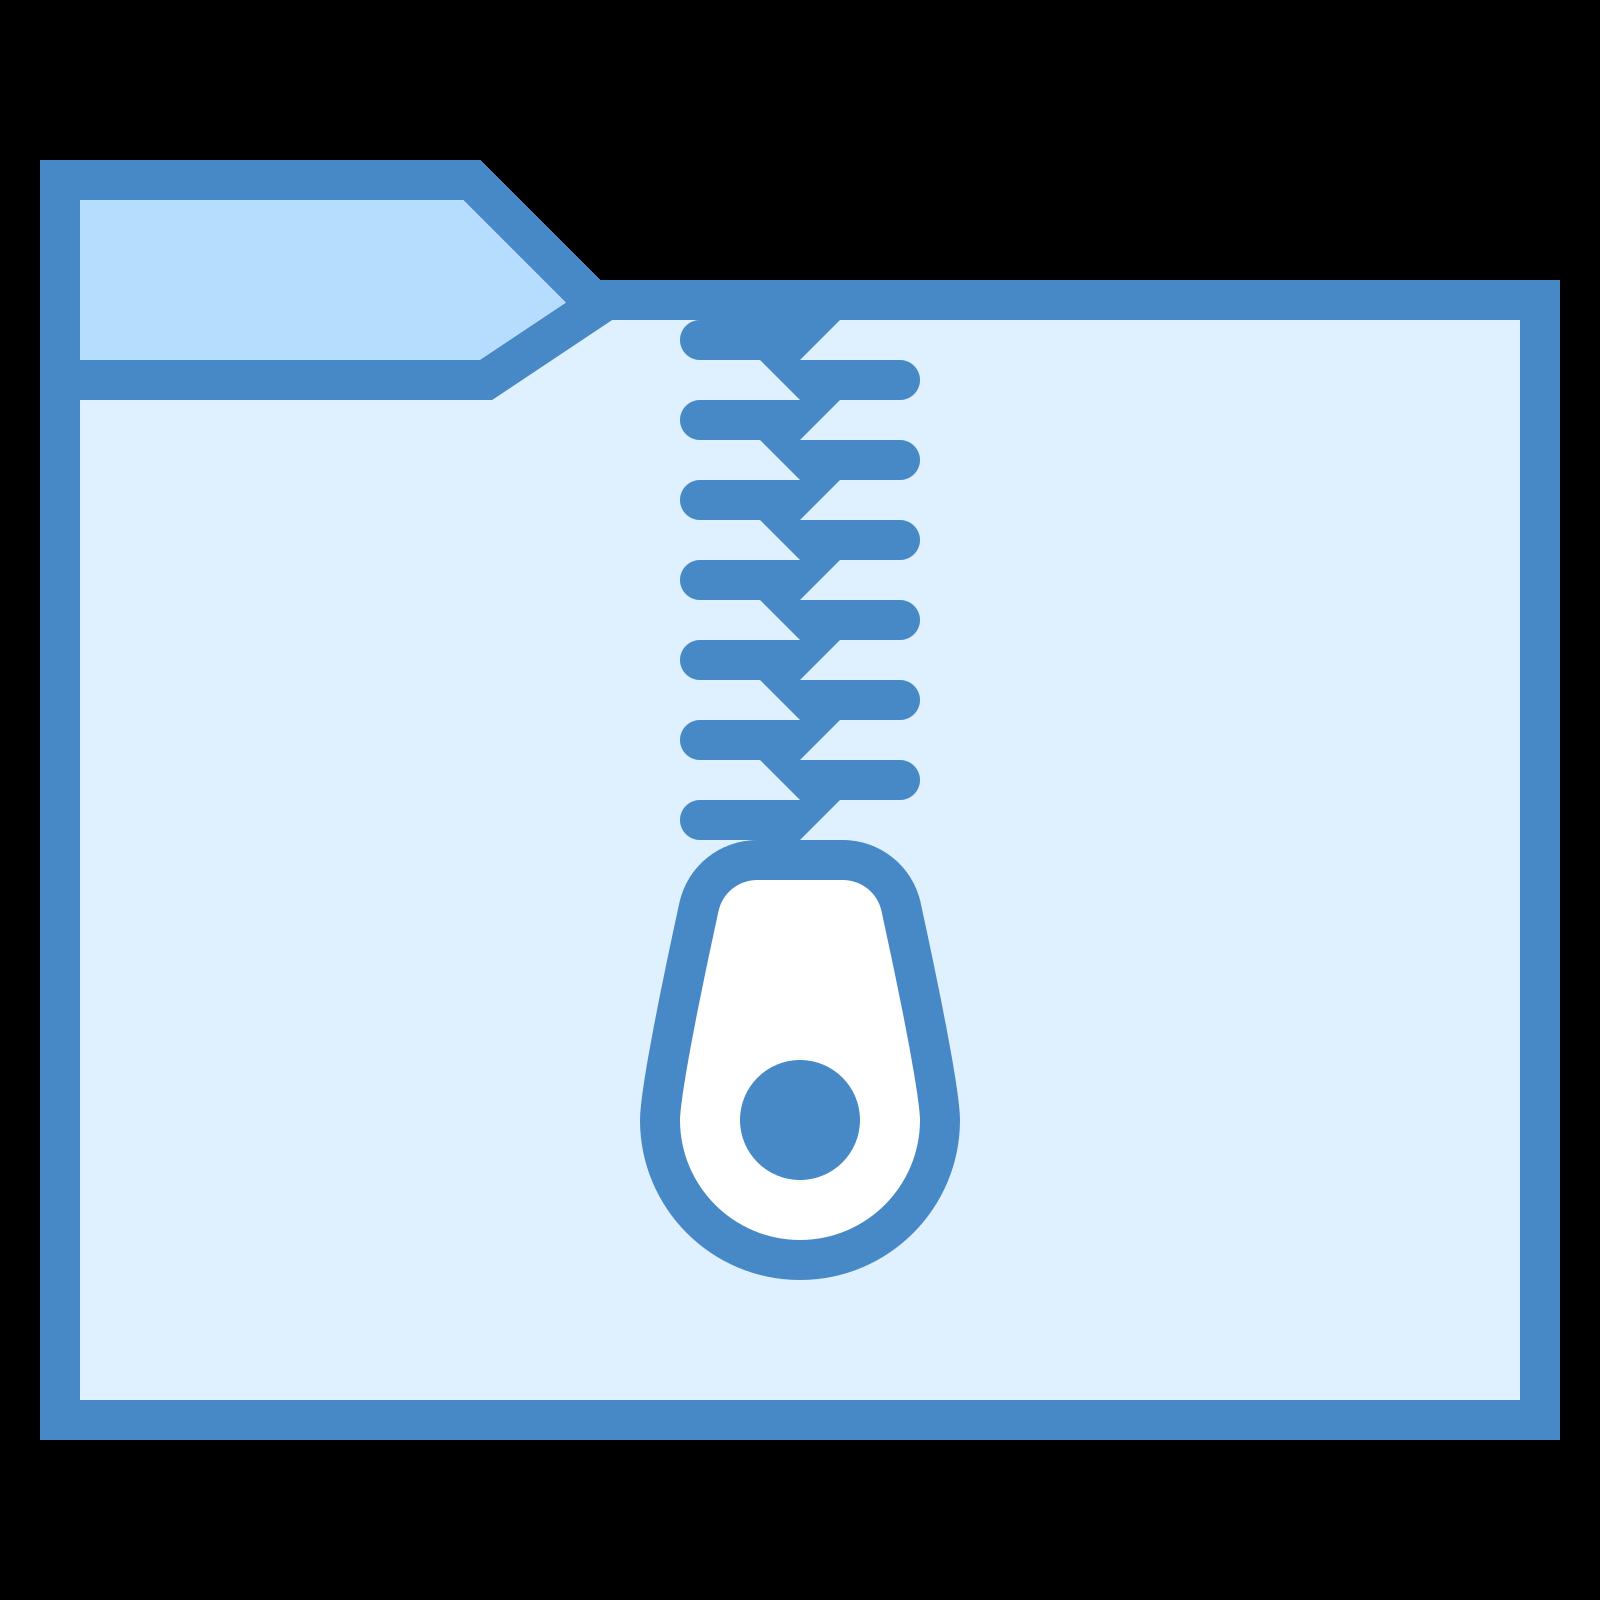 Archive Folder icon